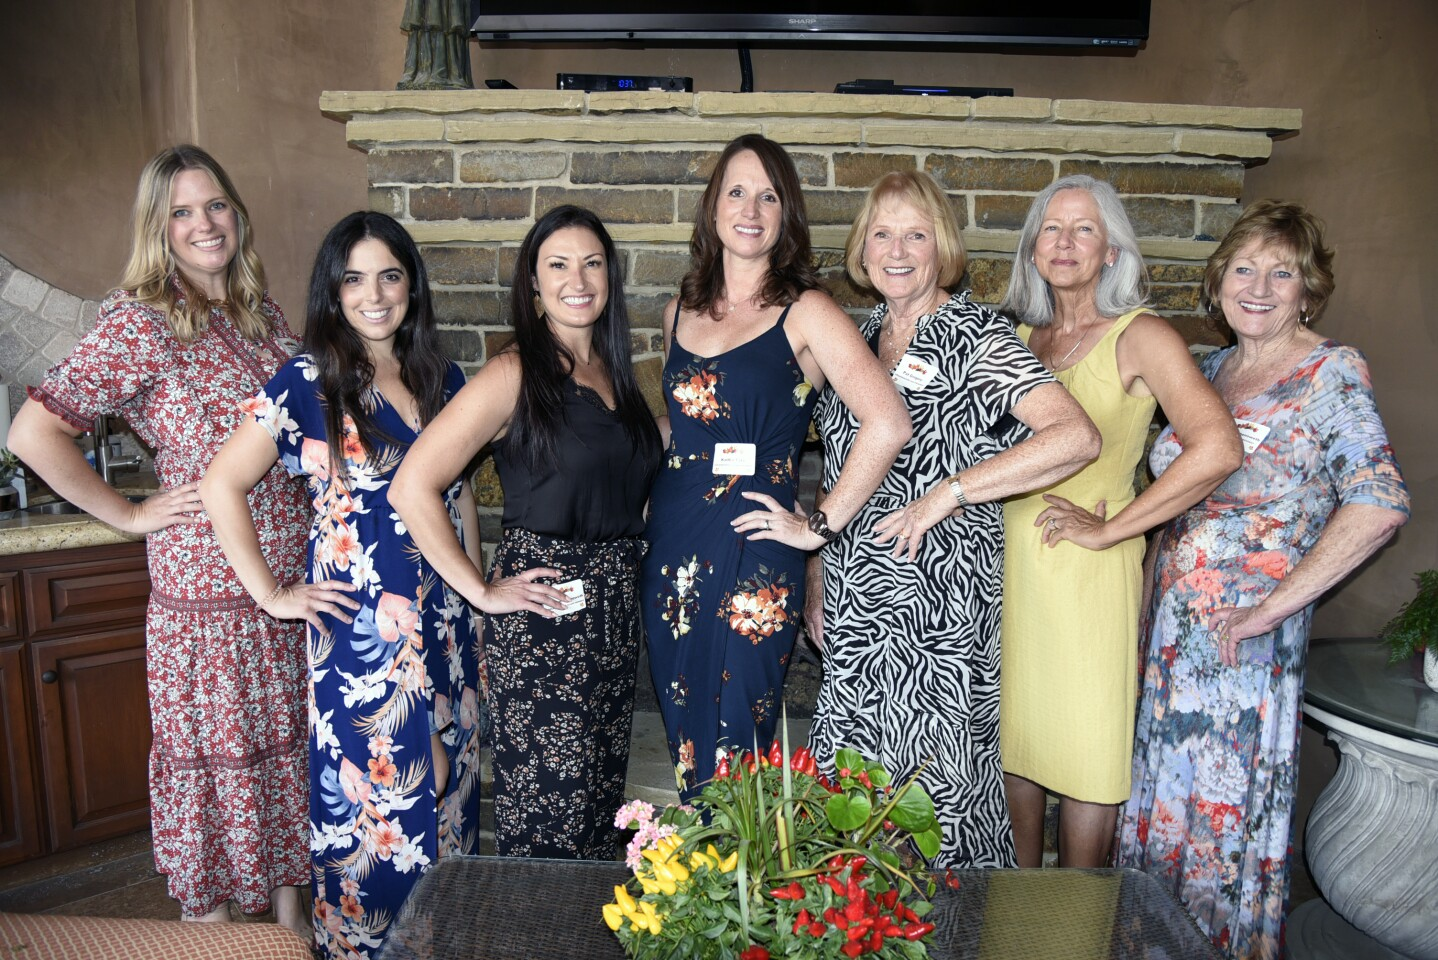 DreamKeepers Project Inc board members Mary Ashley Chenoweth, Alexis Ranglas-Behseta, Kristen Chenoweth, Vice President Pat Gregory, Kaitlin Tate, Secretary Debbie Weiner, President Sandi Chenoweth